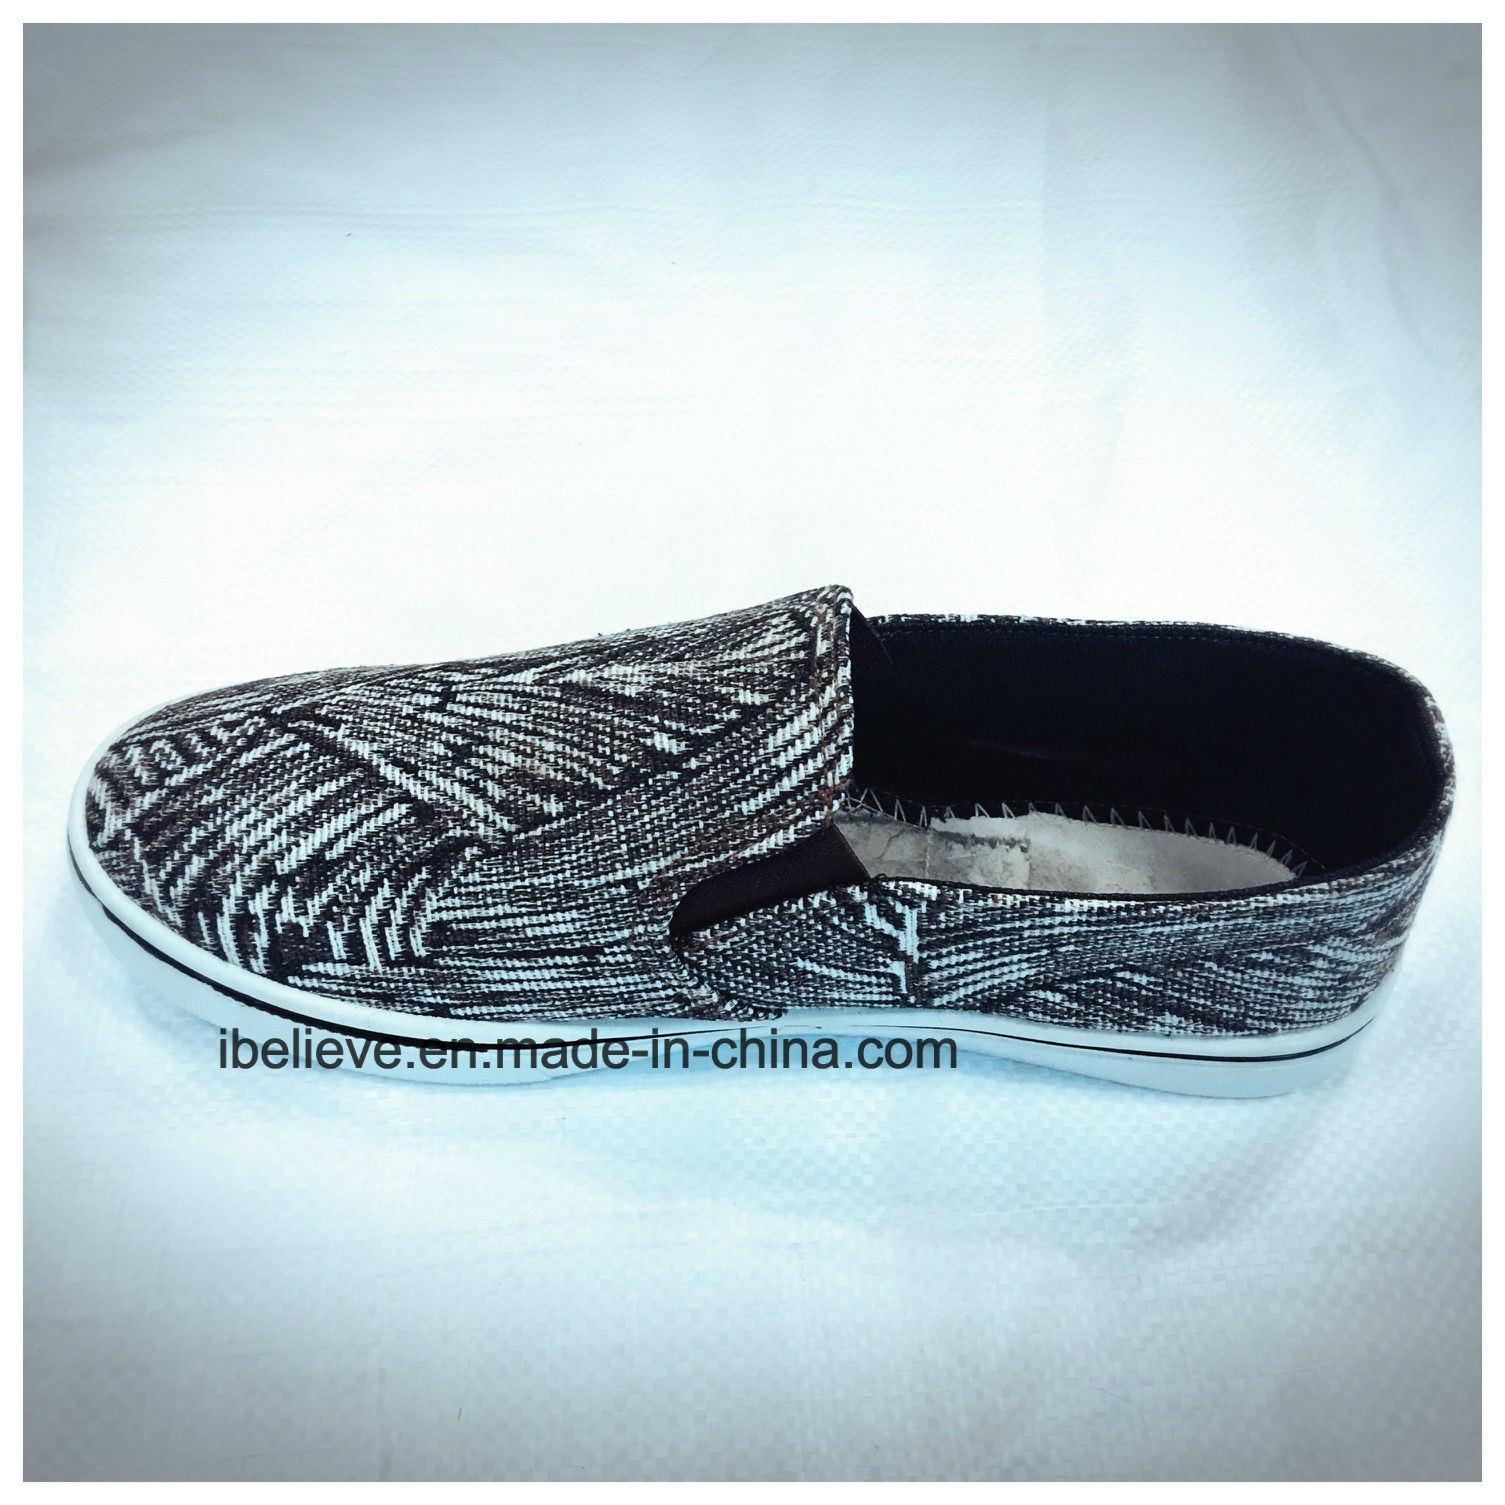 2017 New Design Man Footwear